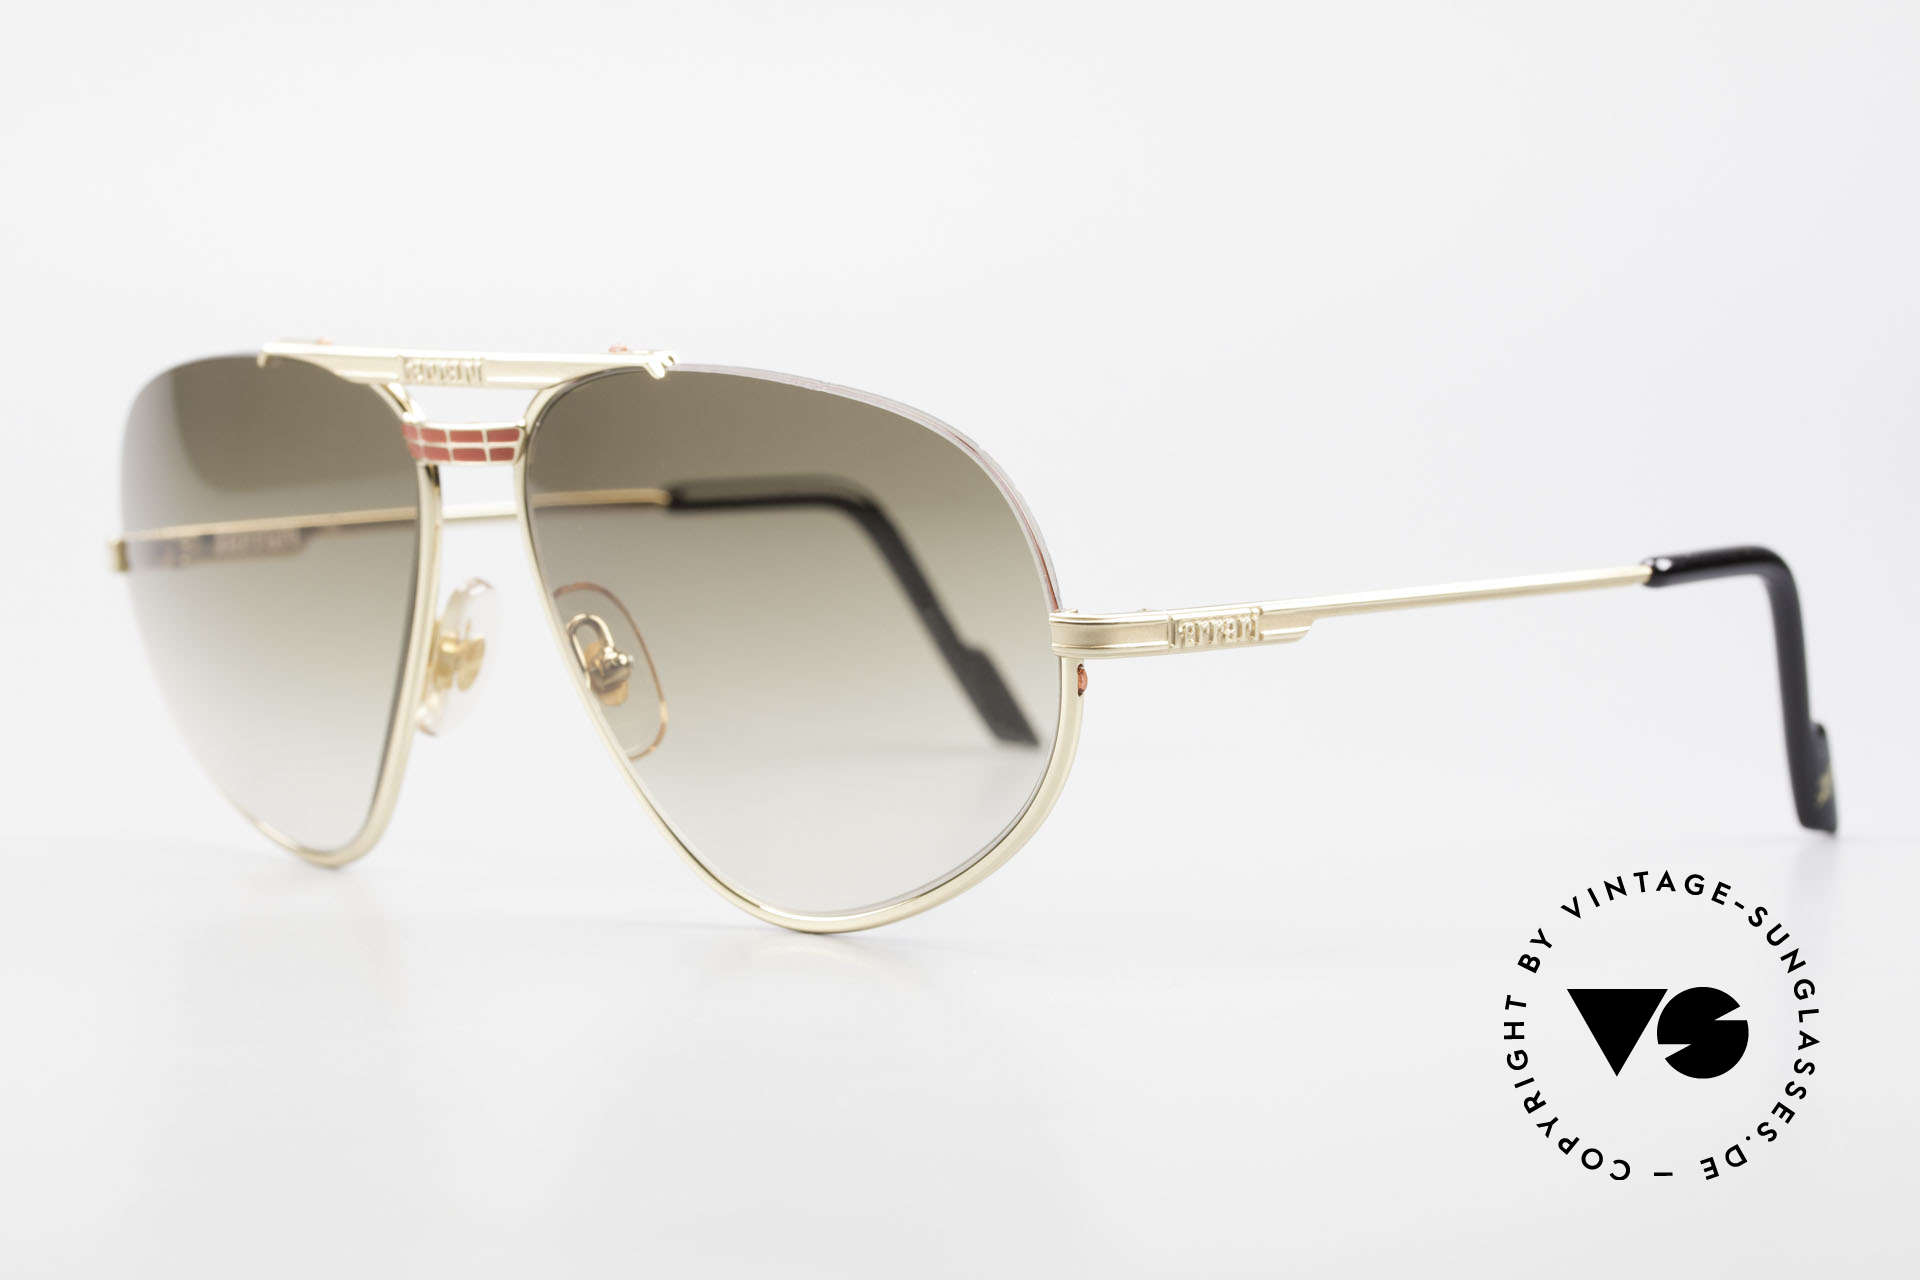 Ferrari F2 Ferrari Formula 1 Sunglasses, orig. name: F2, Ferrari Formula, col. 524, size 61/14, Made for Men